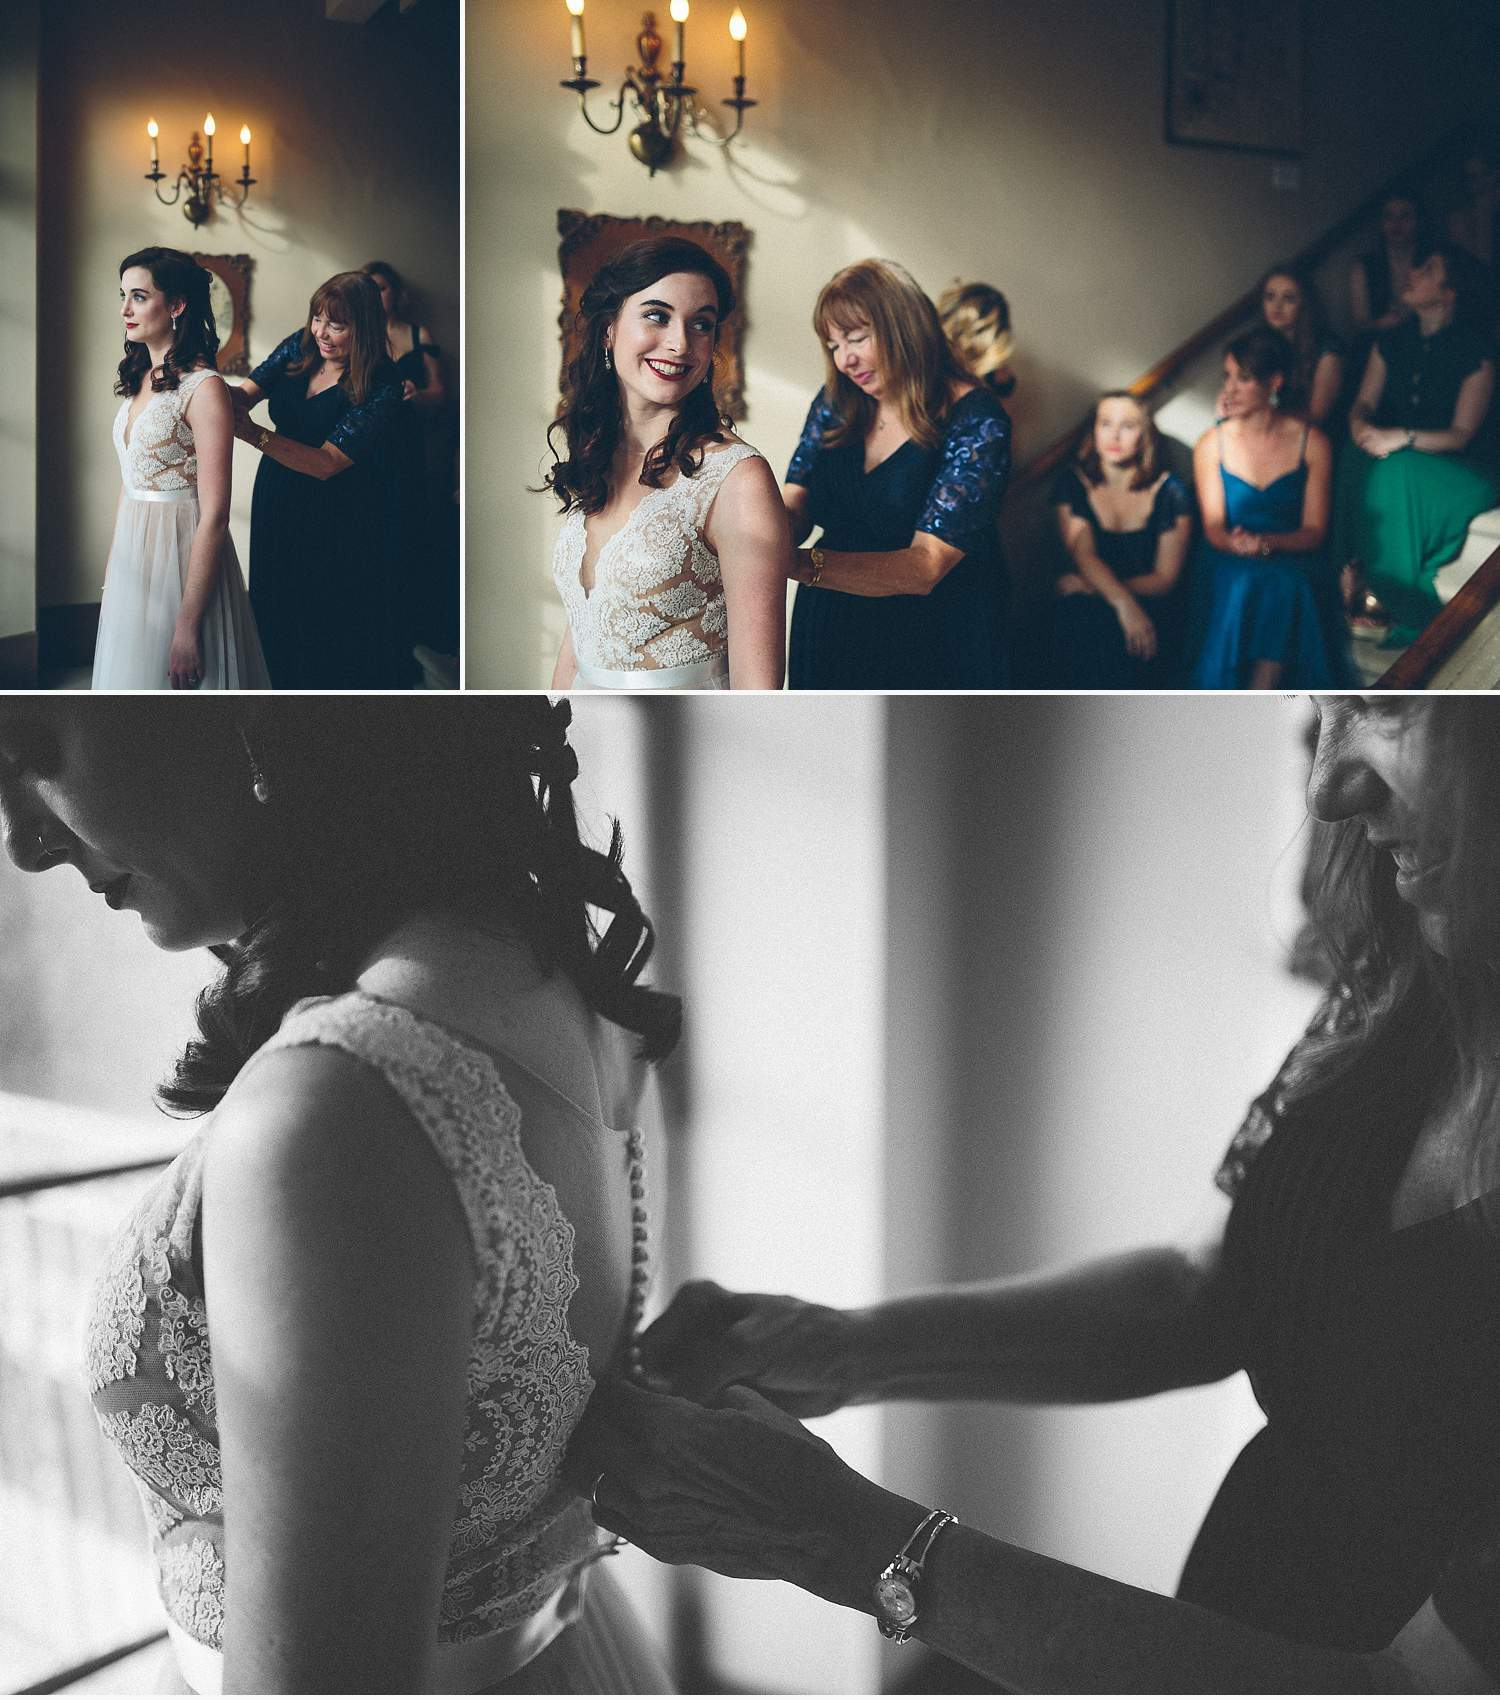 deering-estate-wedding-photographer-daniel-lateulade-006.JPG